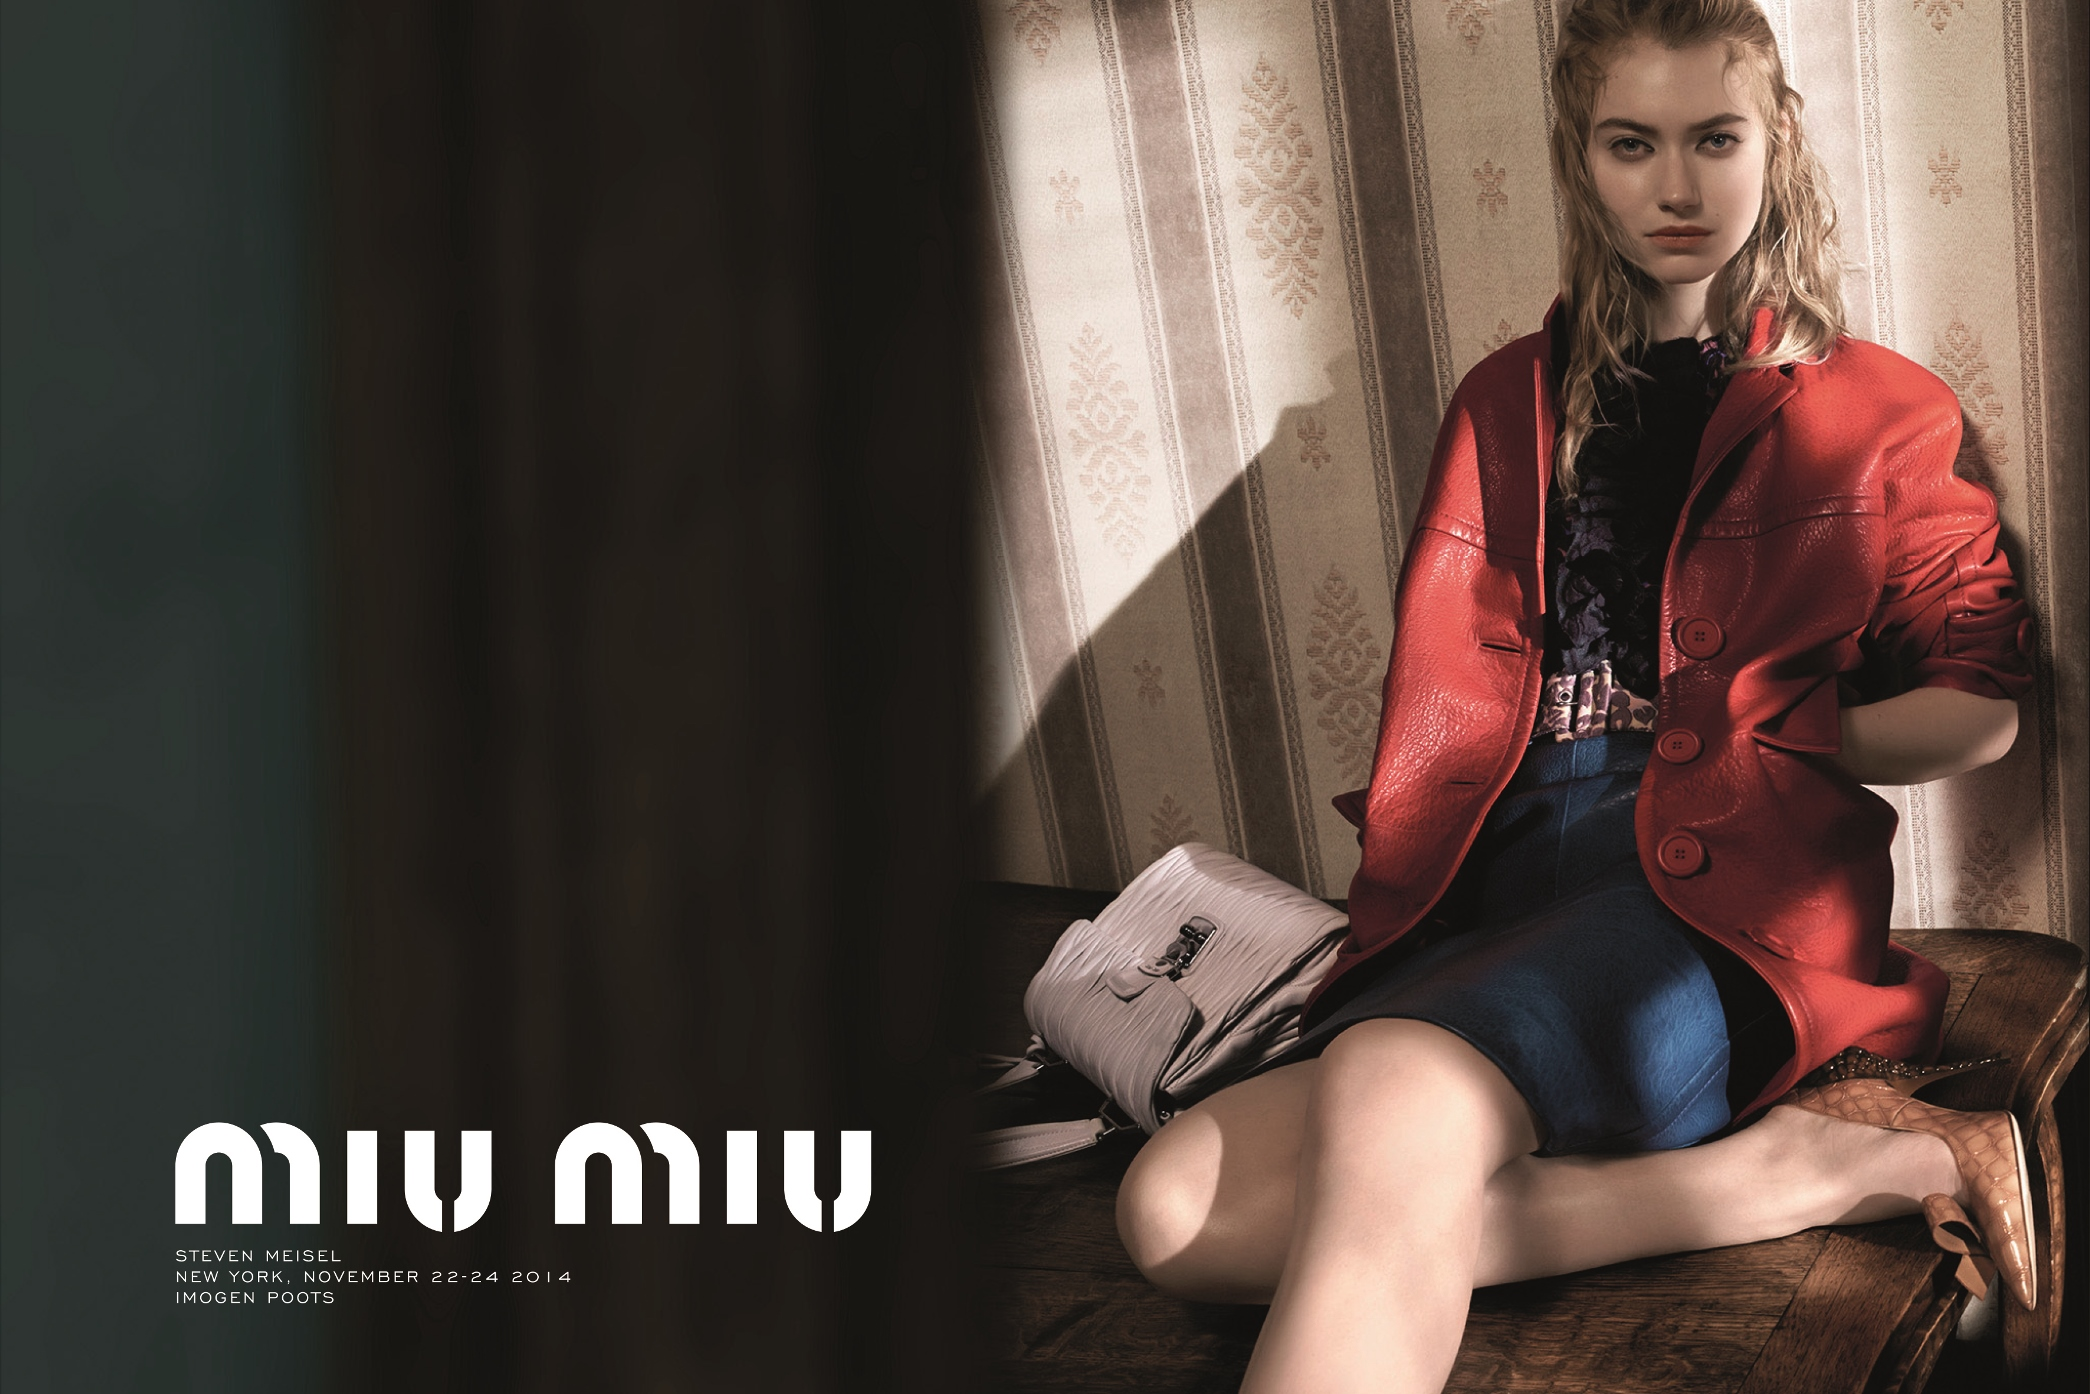 Miu Miu Spring Summer 2015 Adv. Campaign_03.jpg